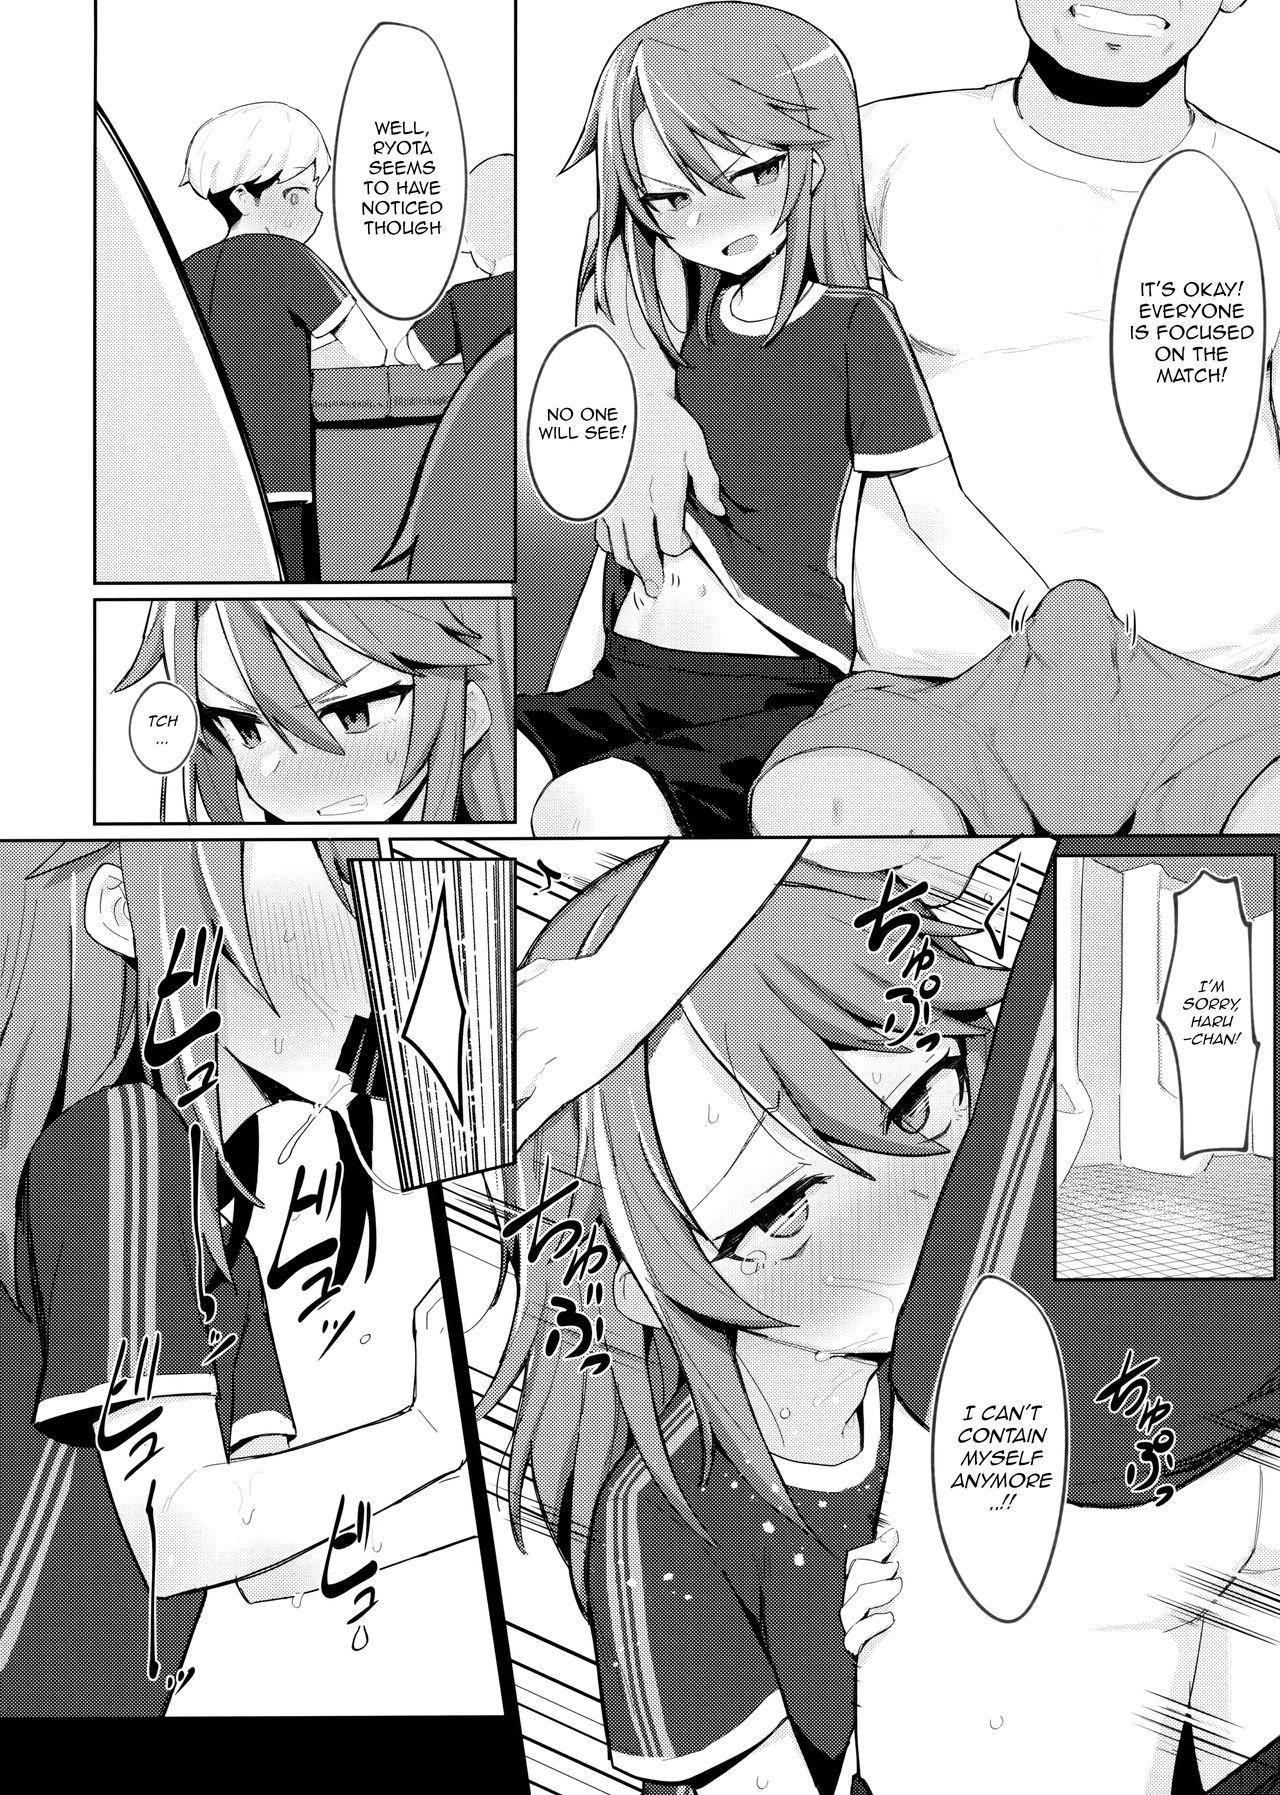 (C97) [Petit Machiya (kylin)] Minna no Haru-chan | Everyone's Haru-chan (THE IDOLM@STER CINDERELLA GIRLS) [English] [aerozext] 20